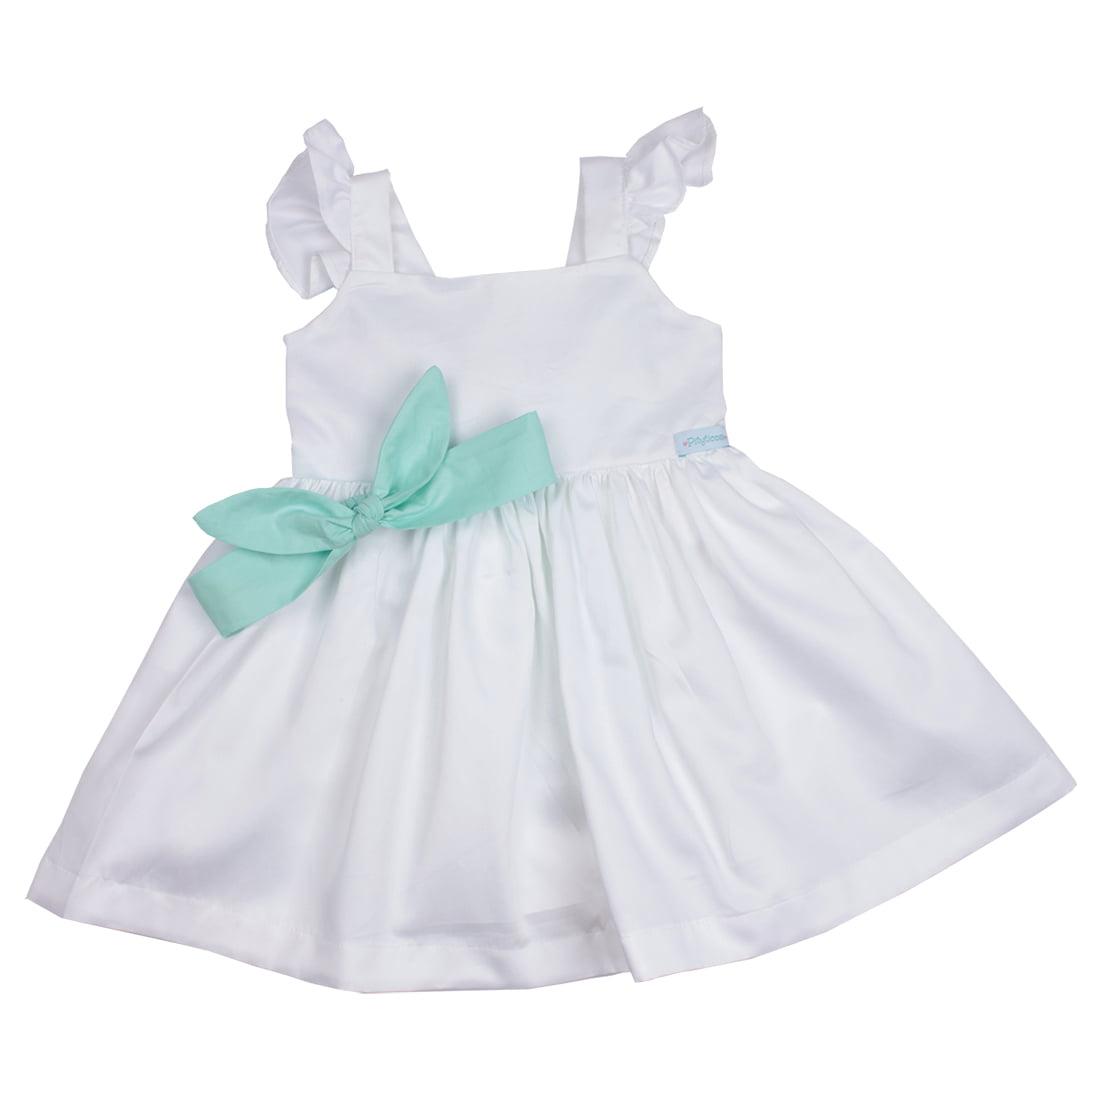 HAPPY NEW YEAR _ KIT VESTIDO INFANTIL BRANCO SOFIA COM VERDE TIFFANY